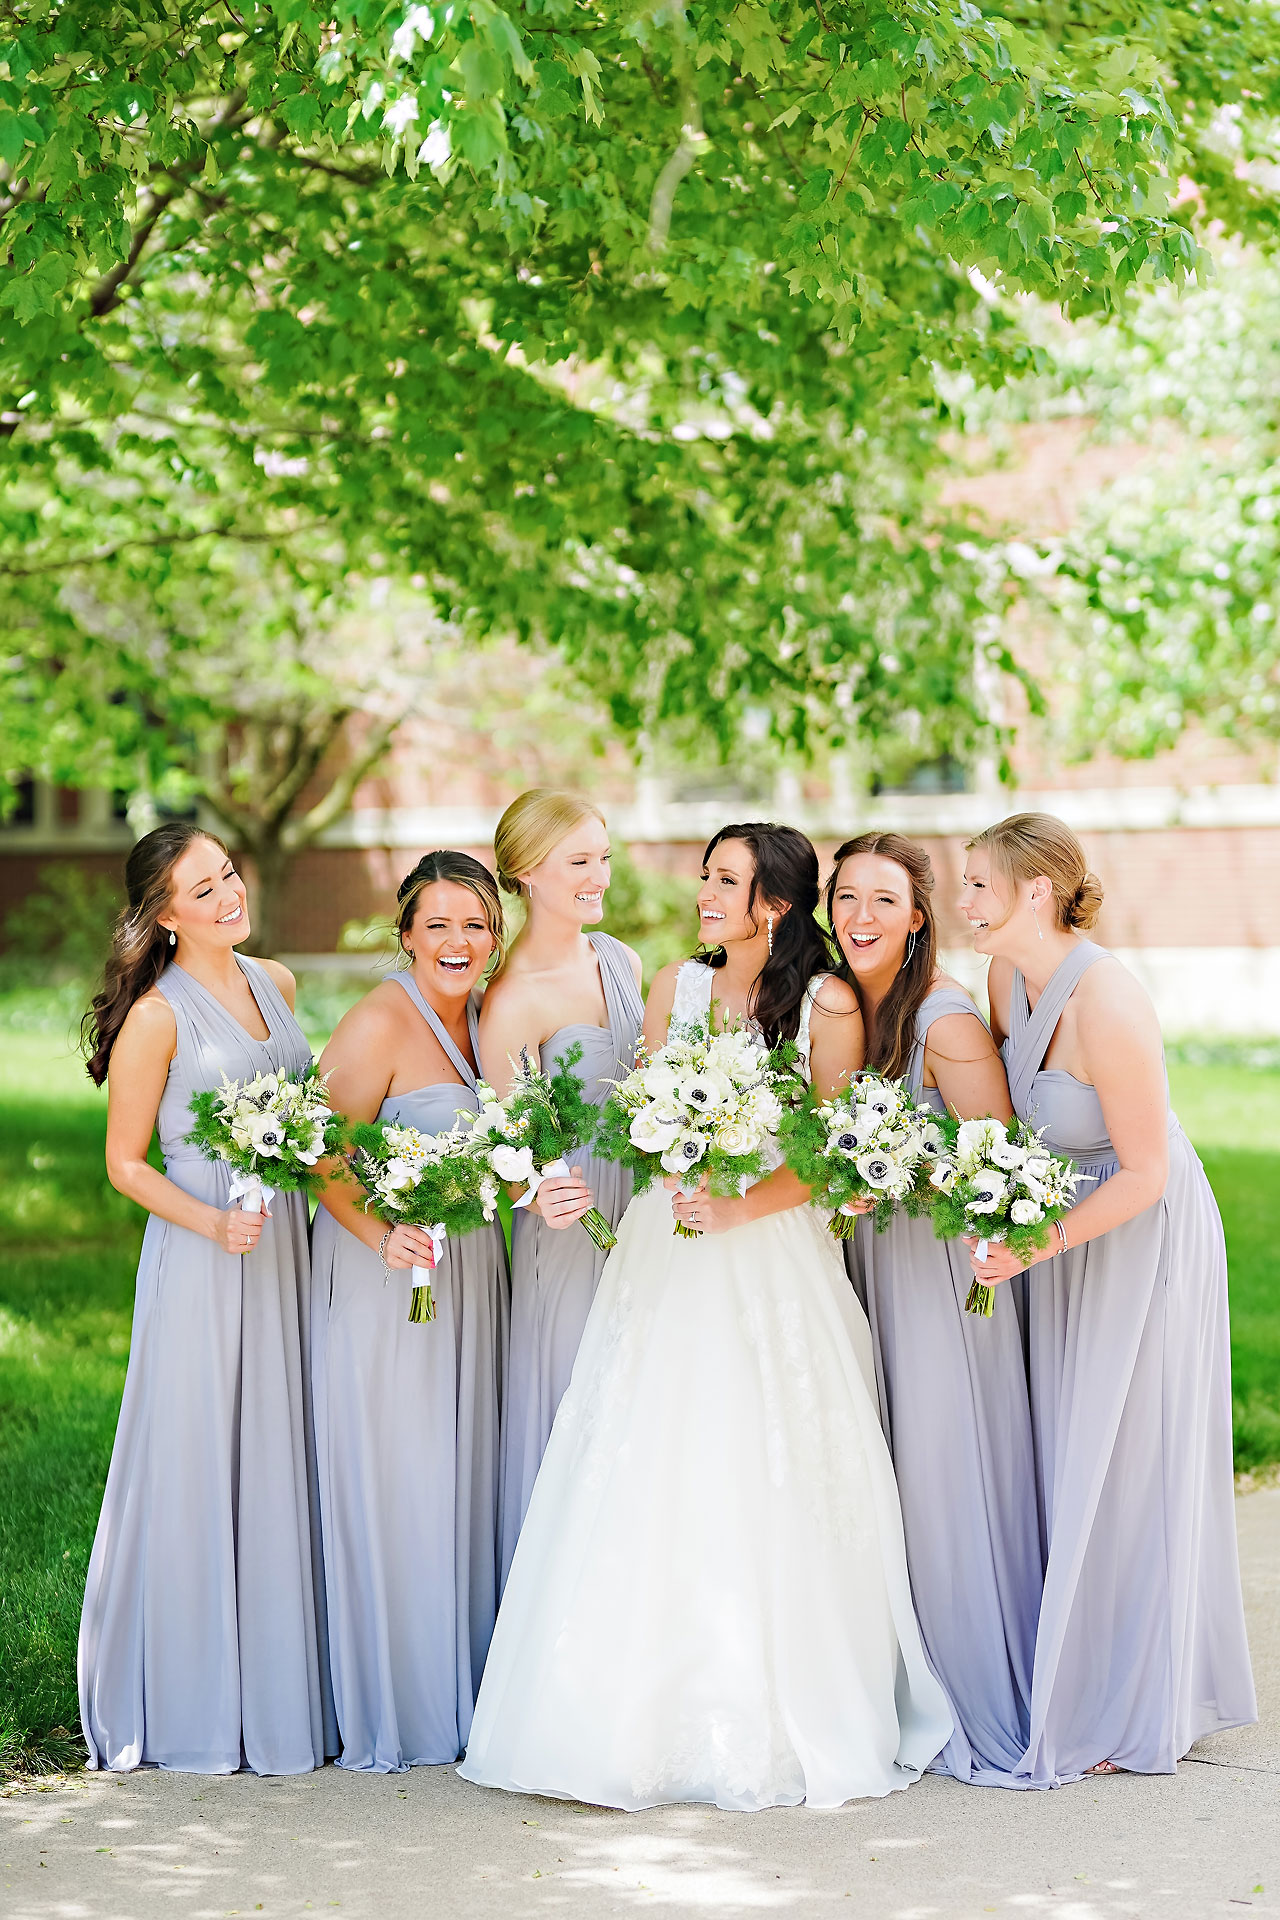 MacKinze John Lafayette Indiana Purdue Wedding 097